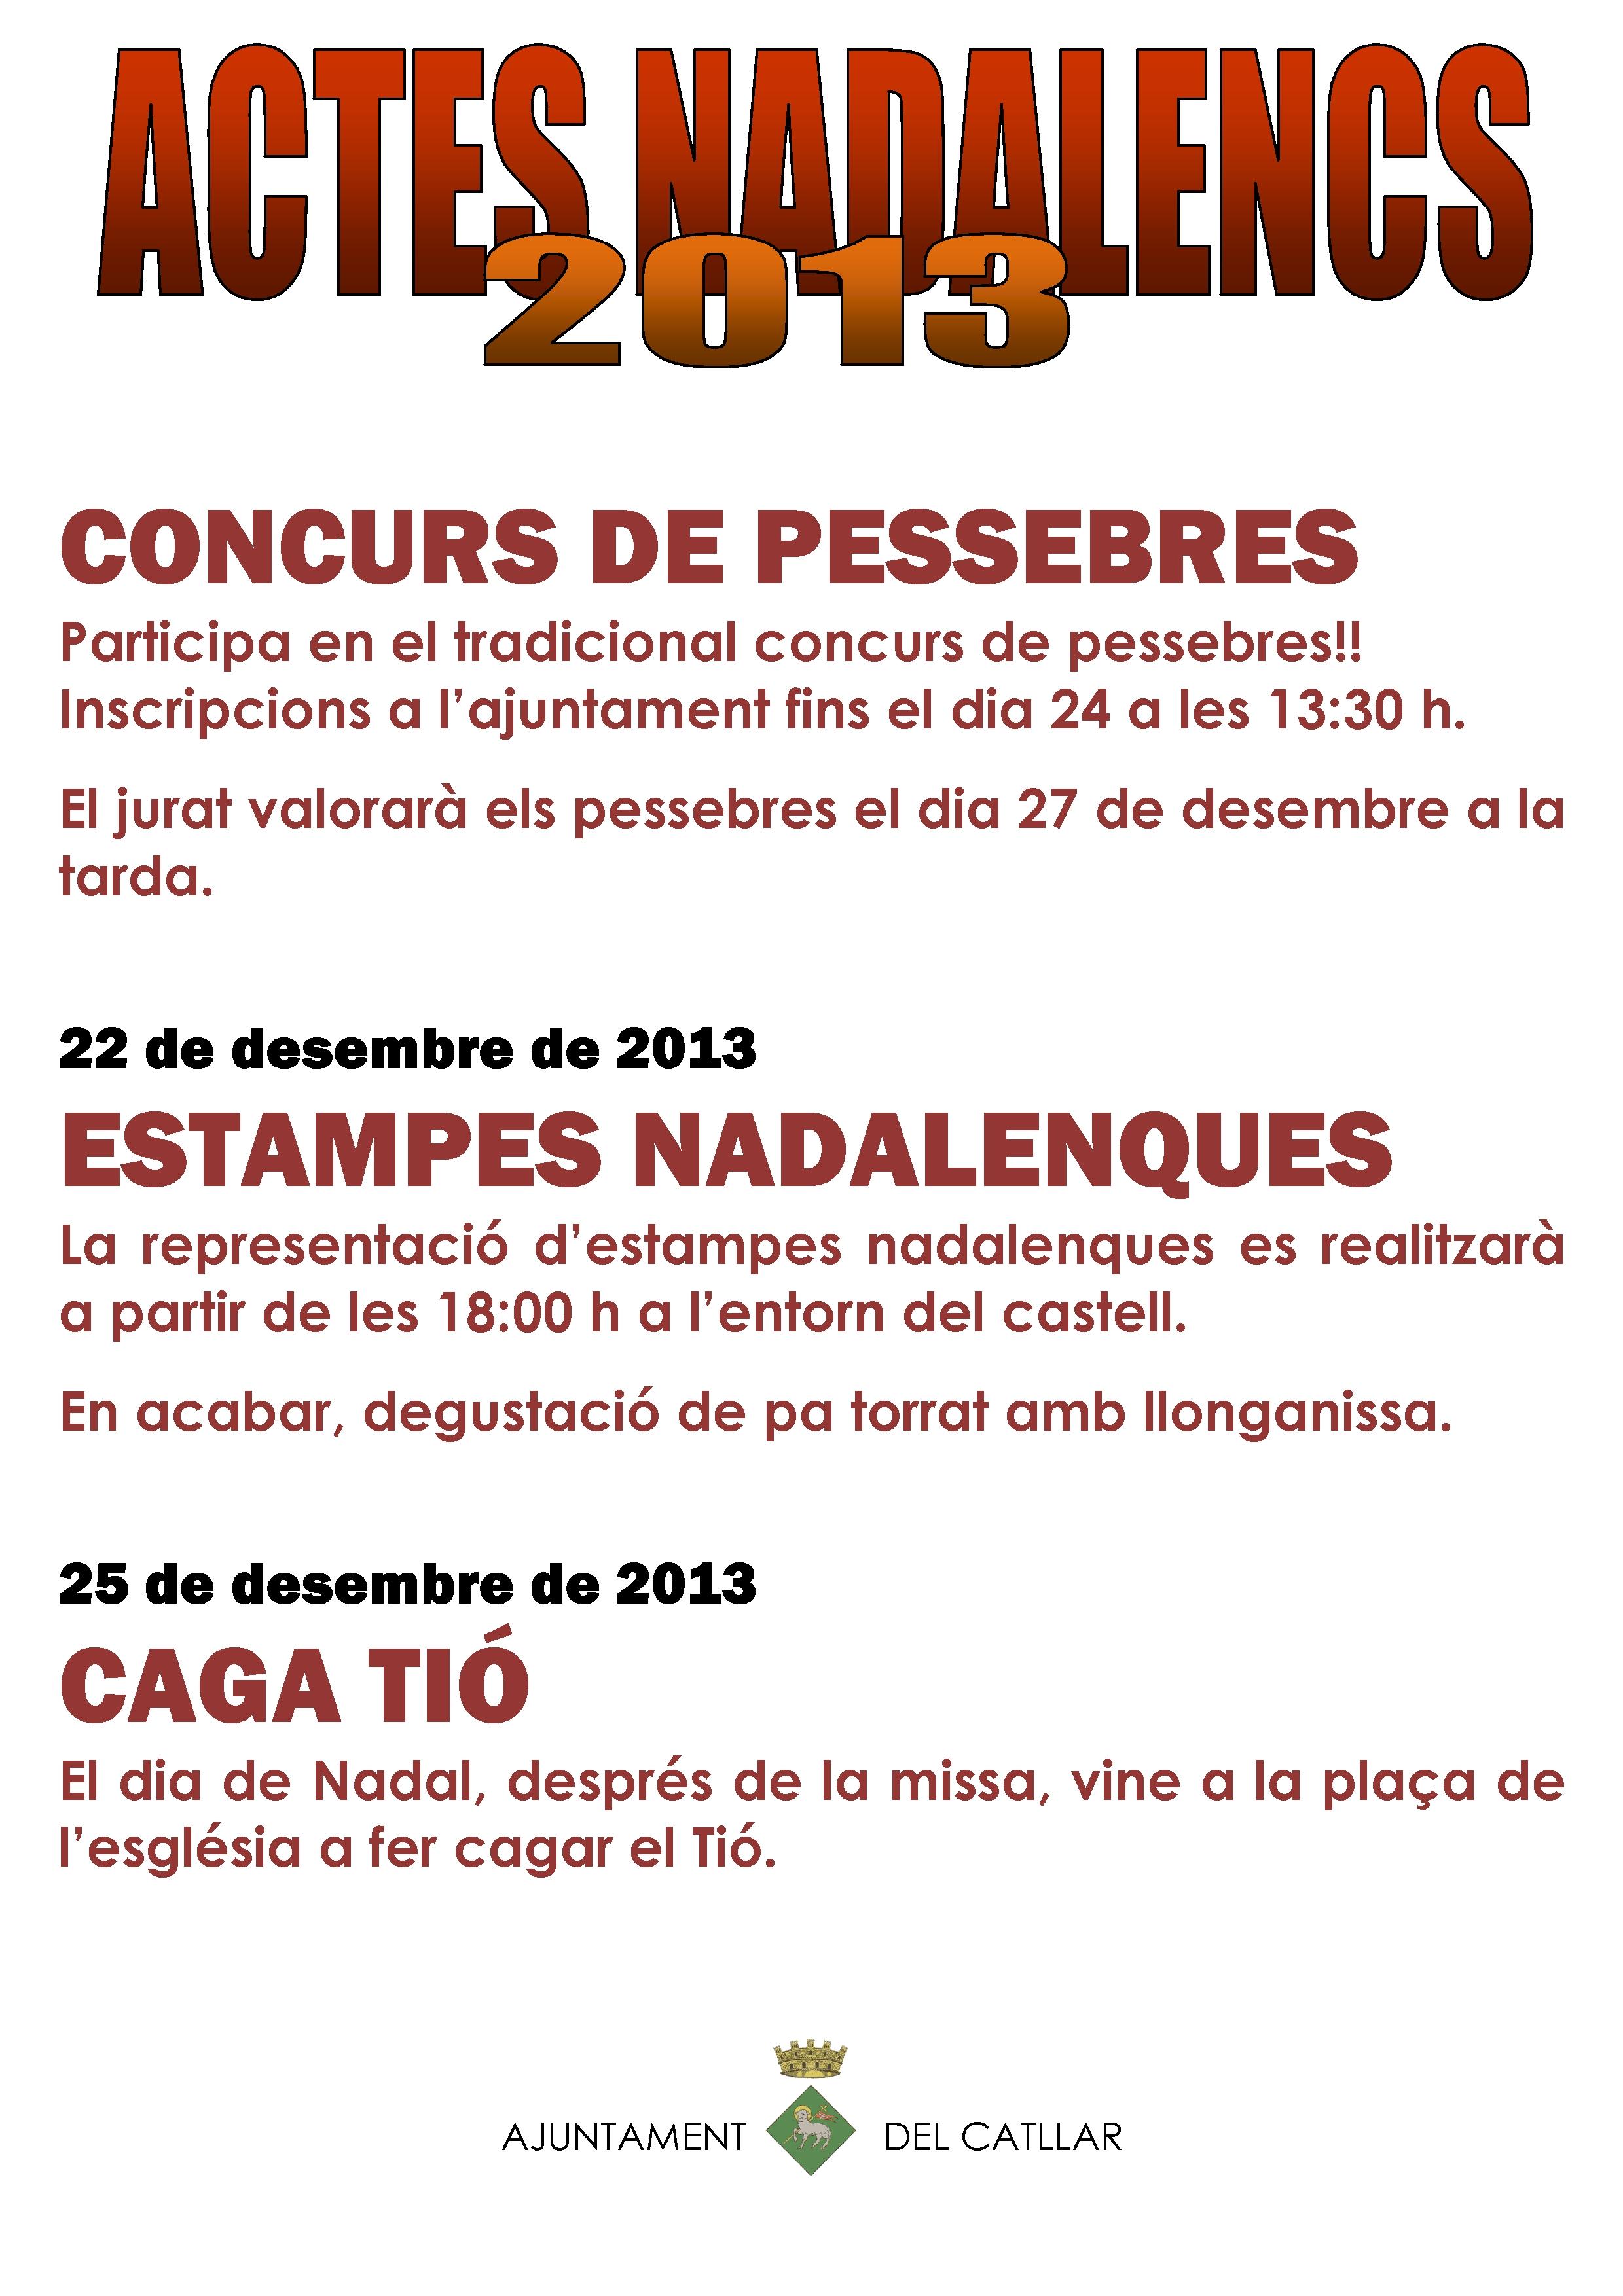 ACTOS NAVIDEÑOS 2013